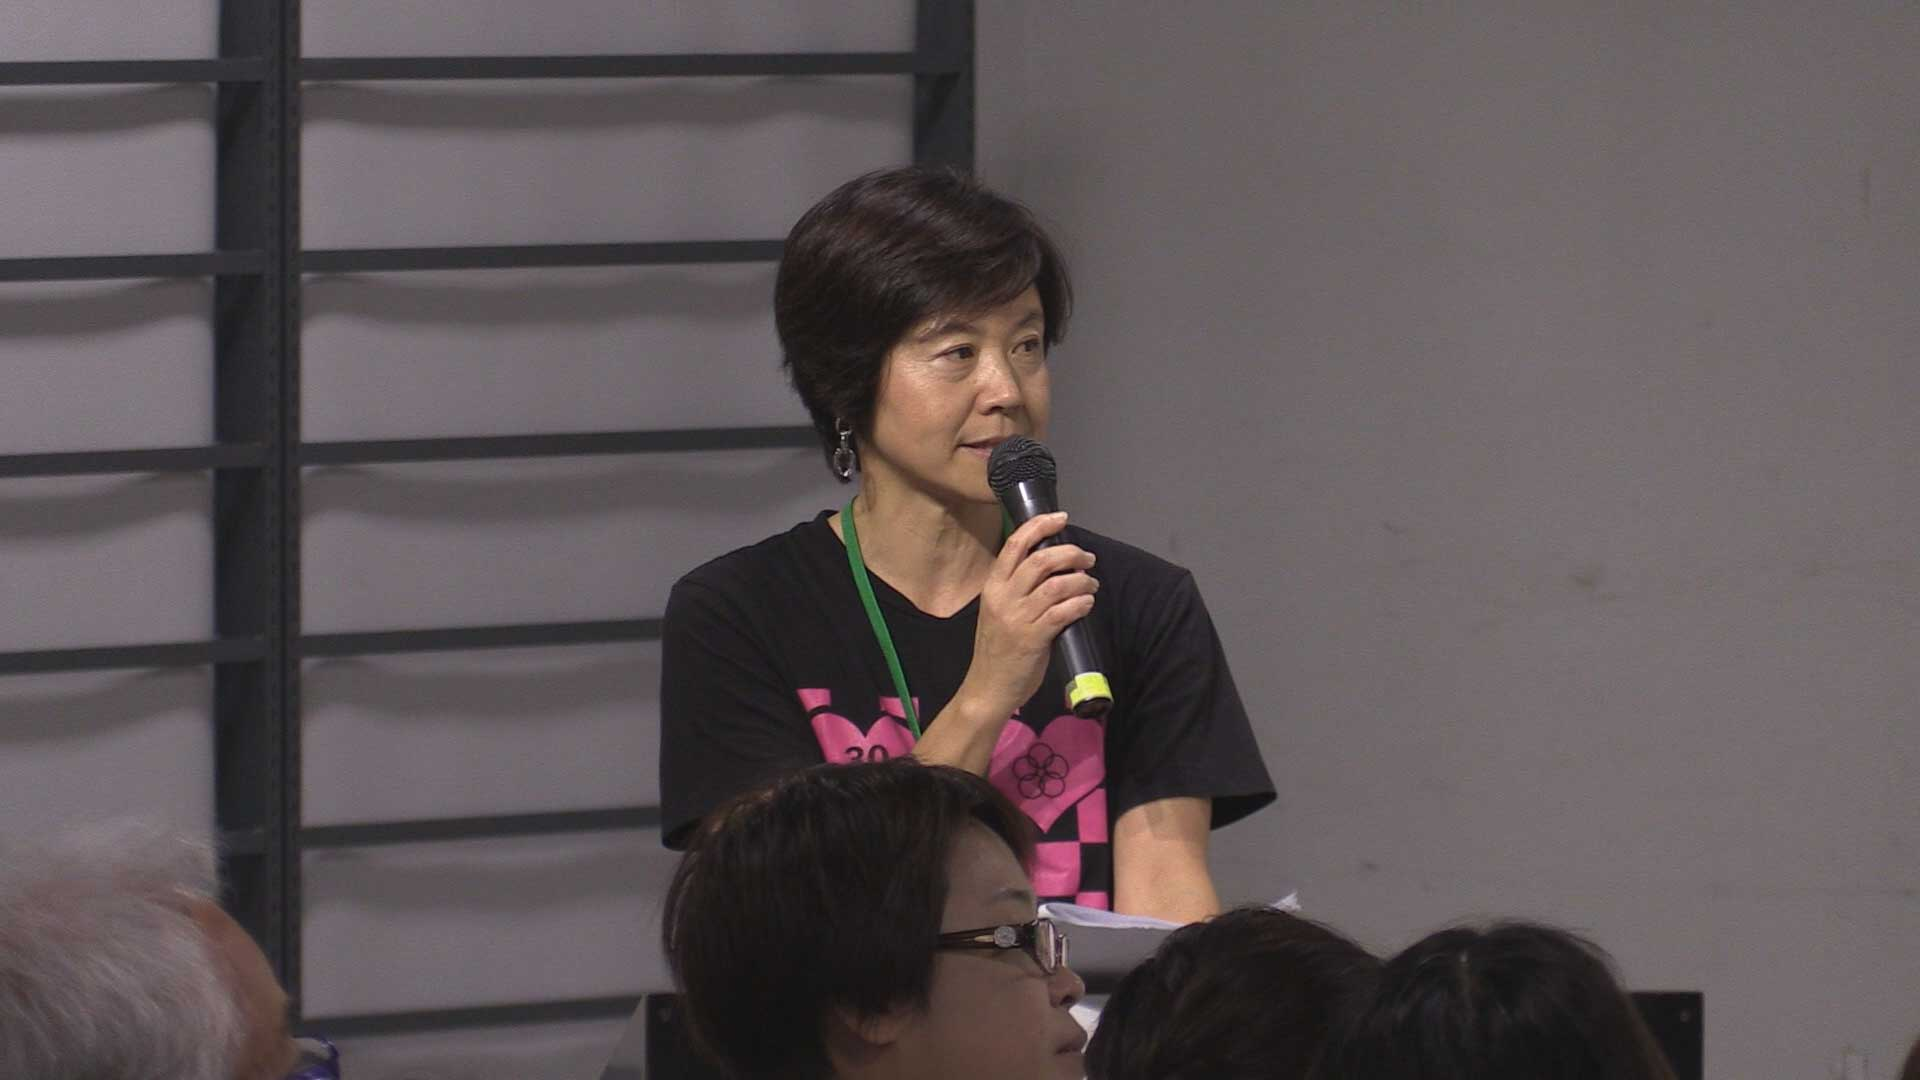 TOLフォーラム2018 併催「TOLベストオリンピアン賞授与式」